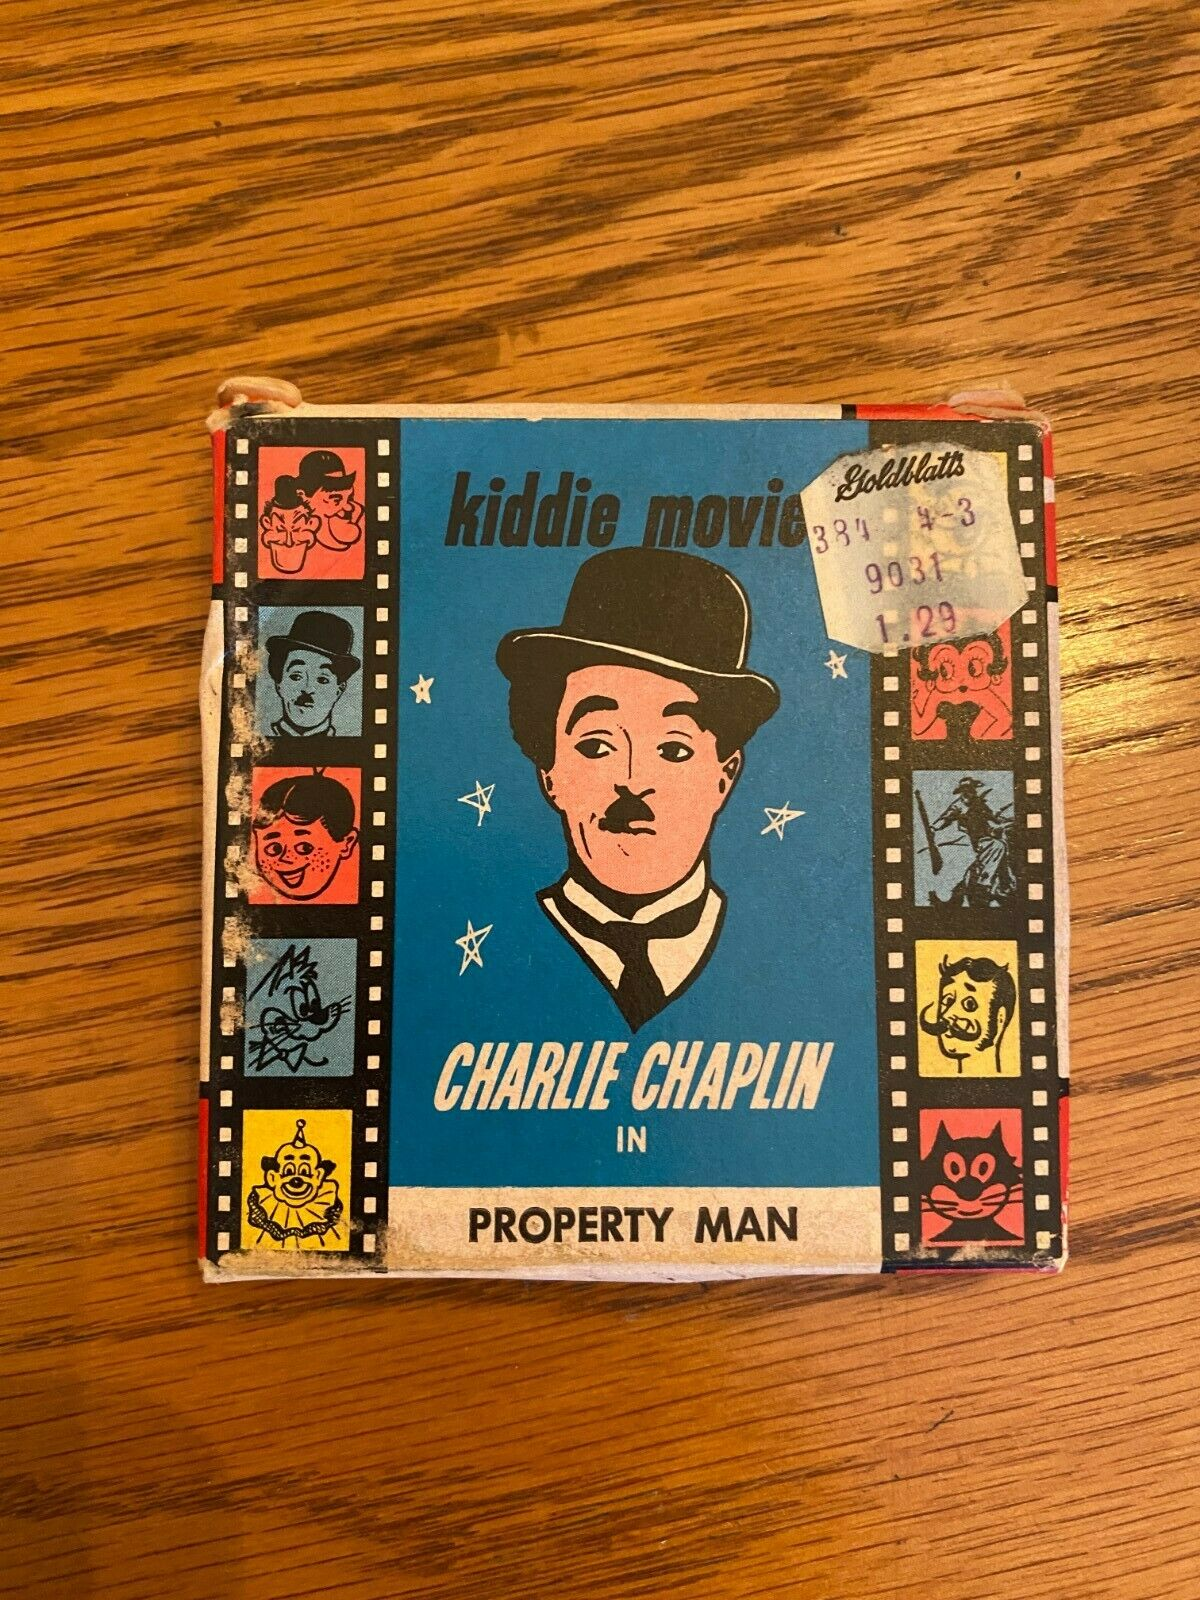 8MM Kiddie Movies - Charlie Chaplin In Property Man - CH 4 - $0.99